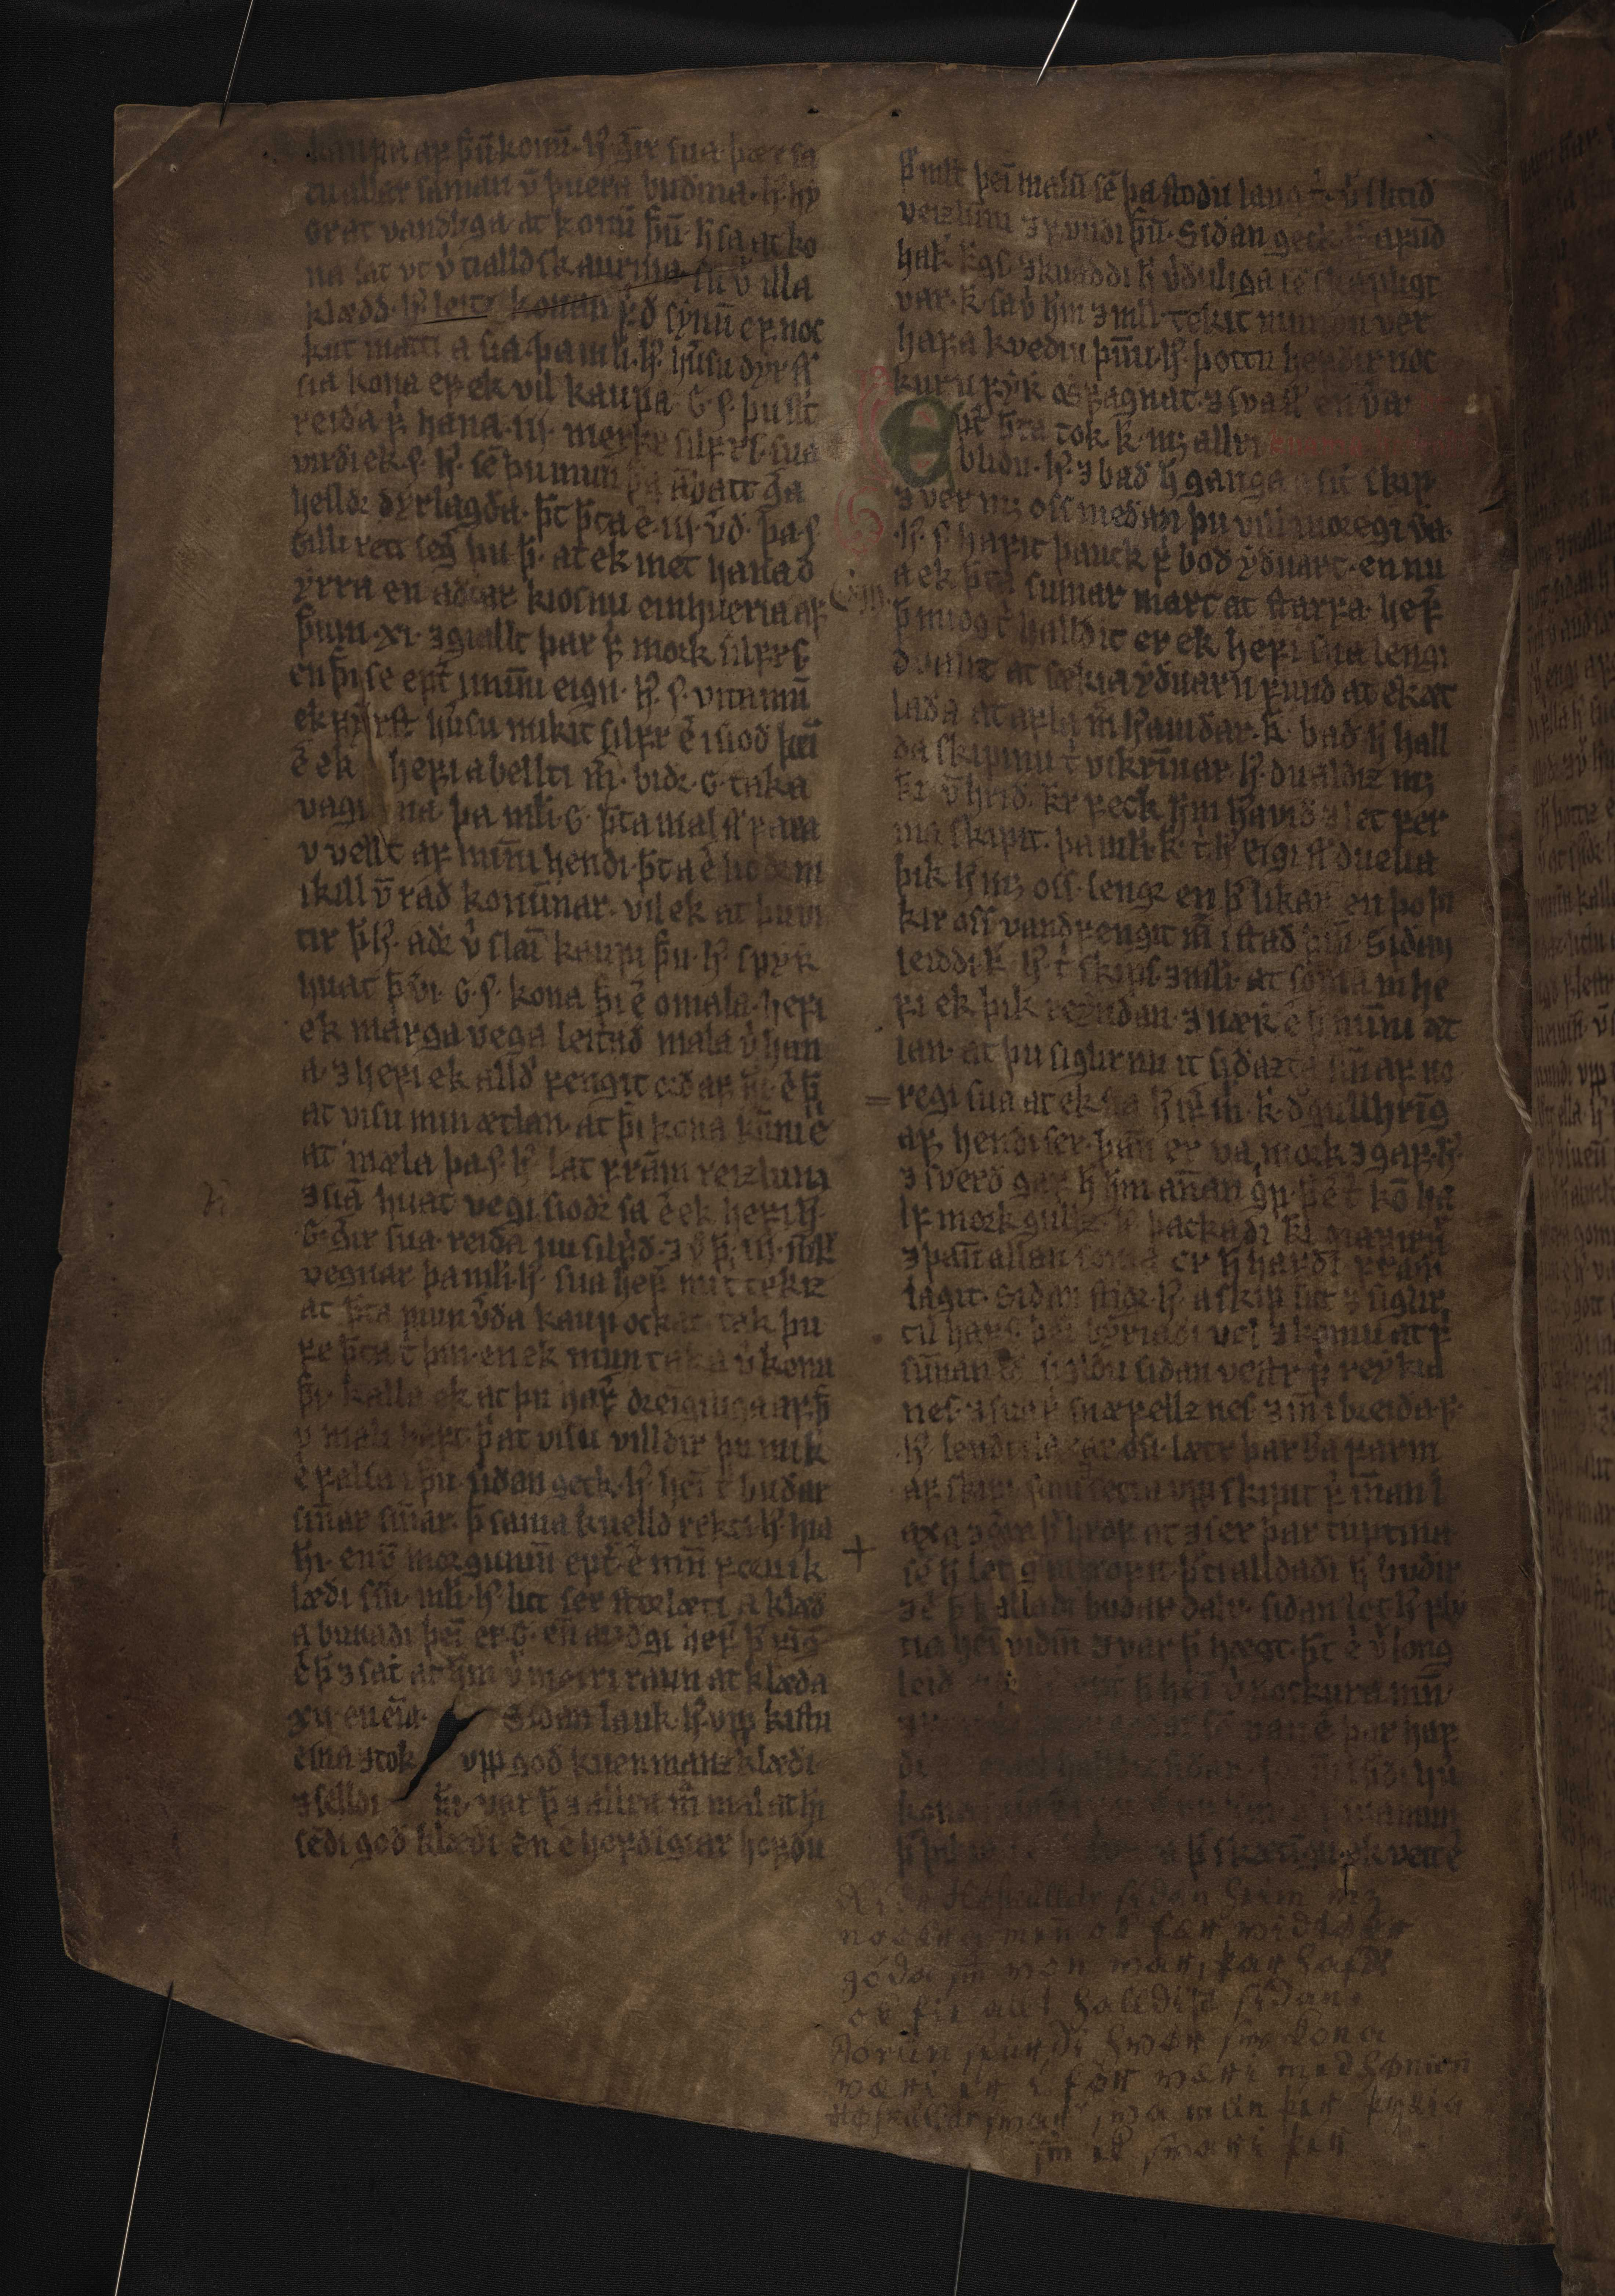 AM 132 fol - 159v